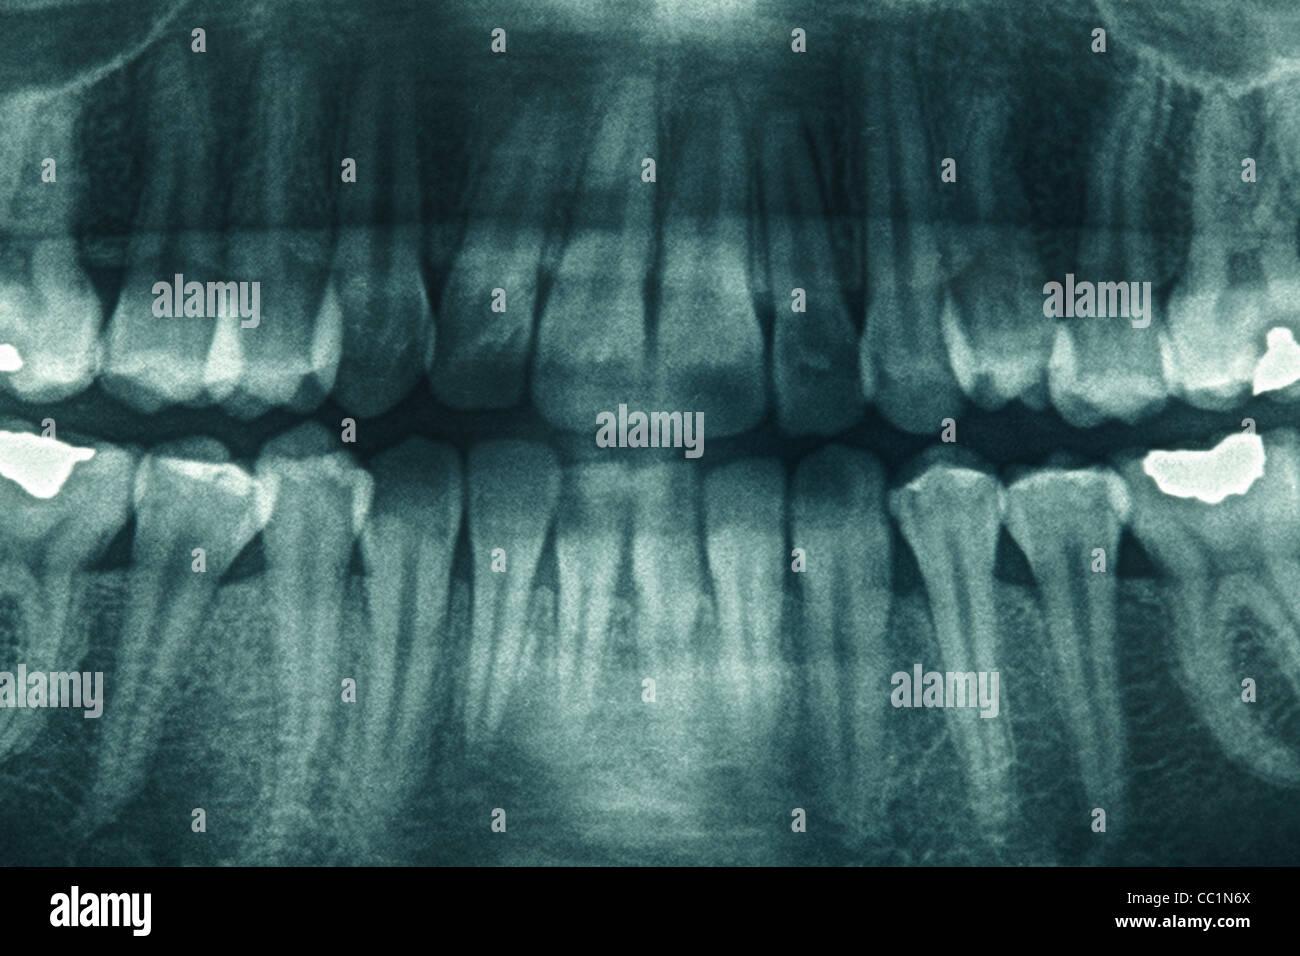 Dental xray - Stock Image